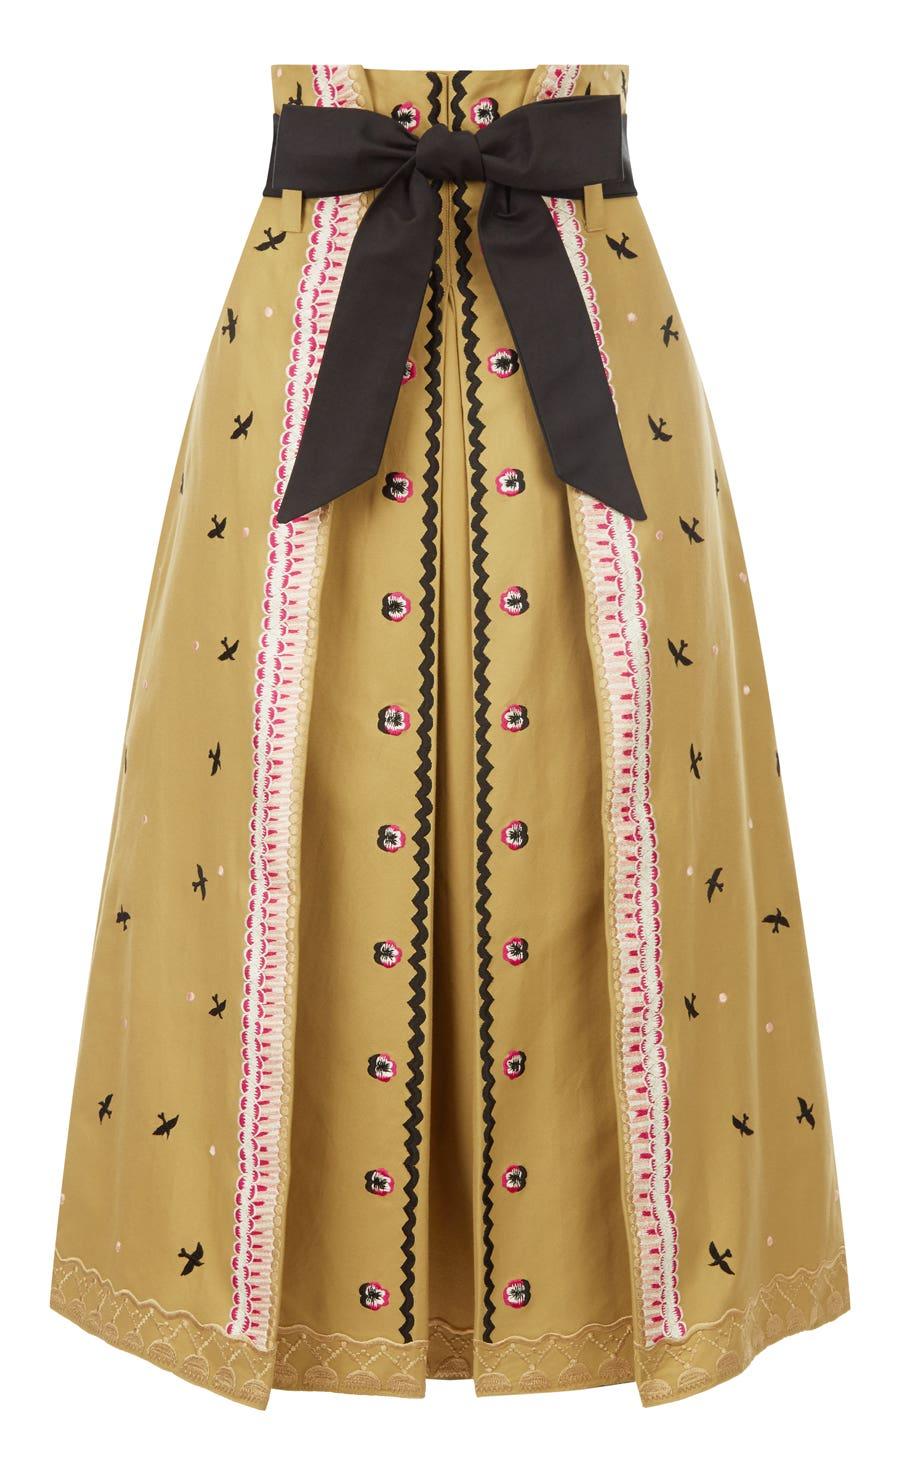 Poppy Field Skirt, Flax Mix